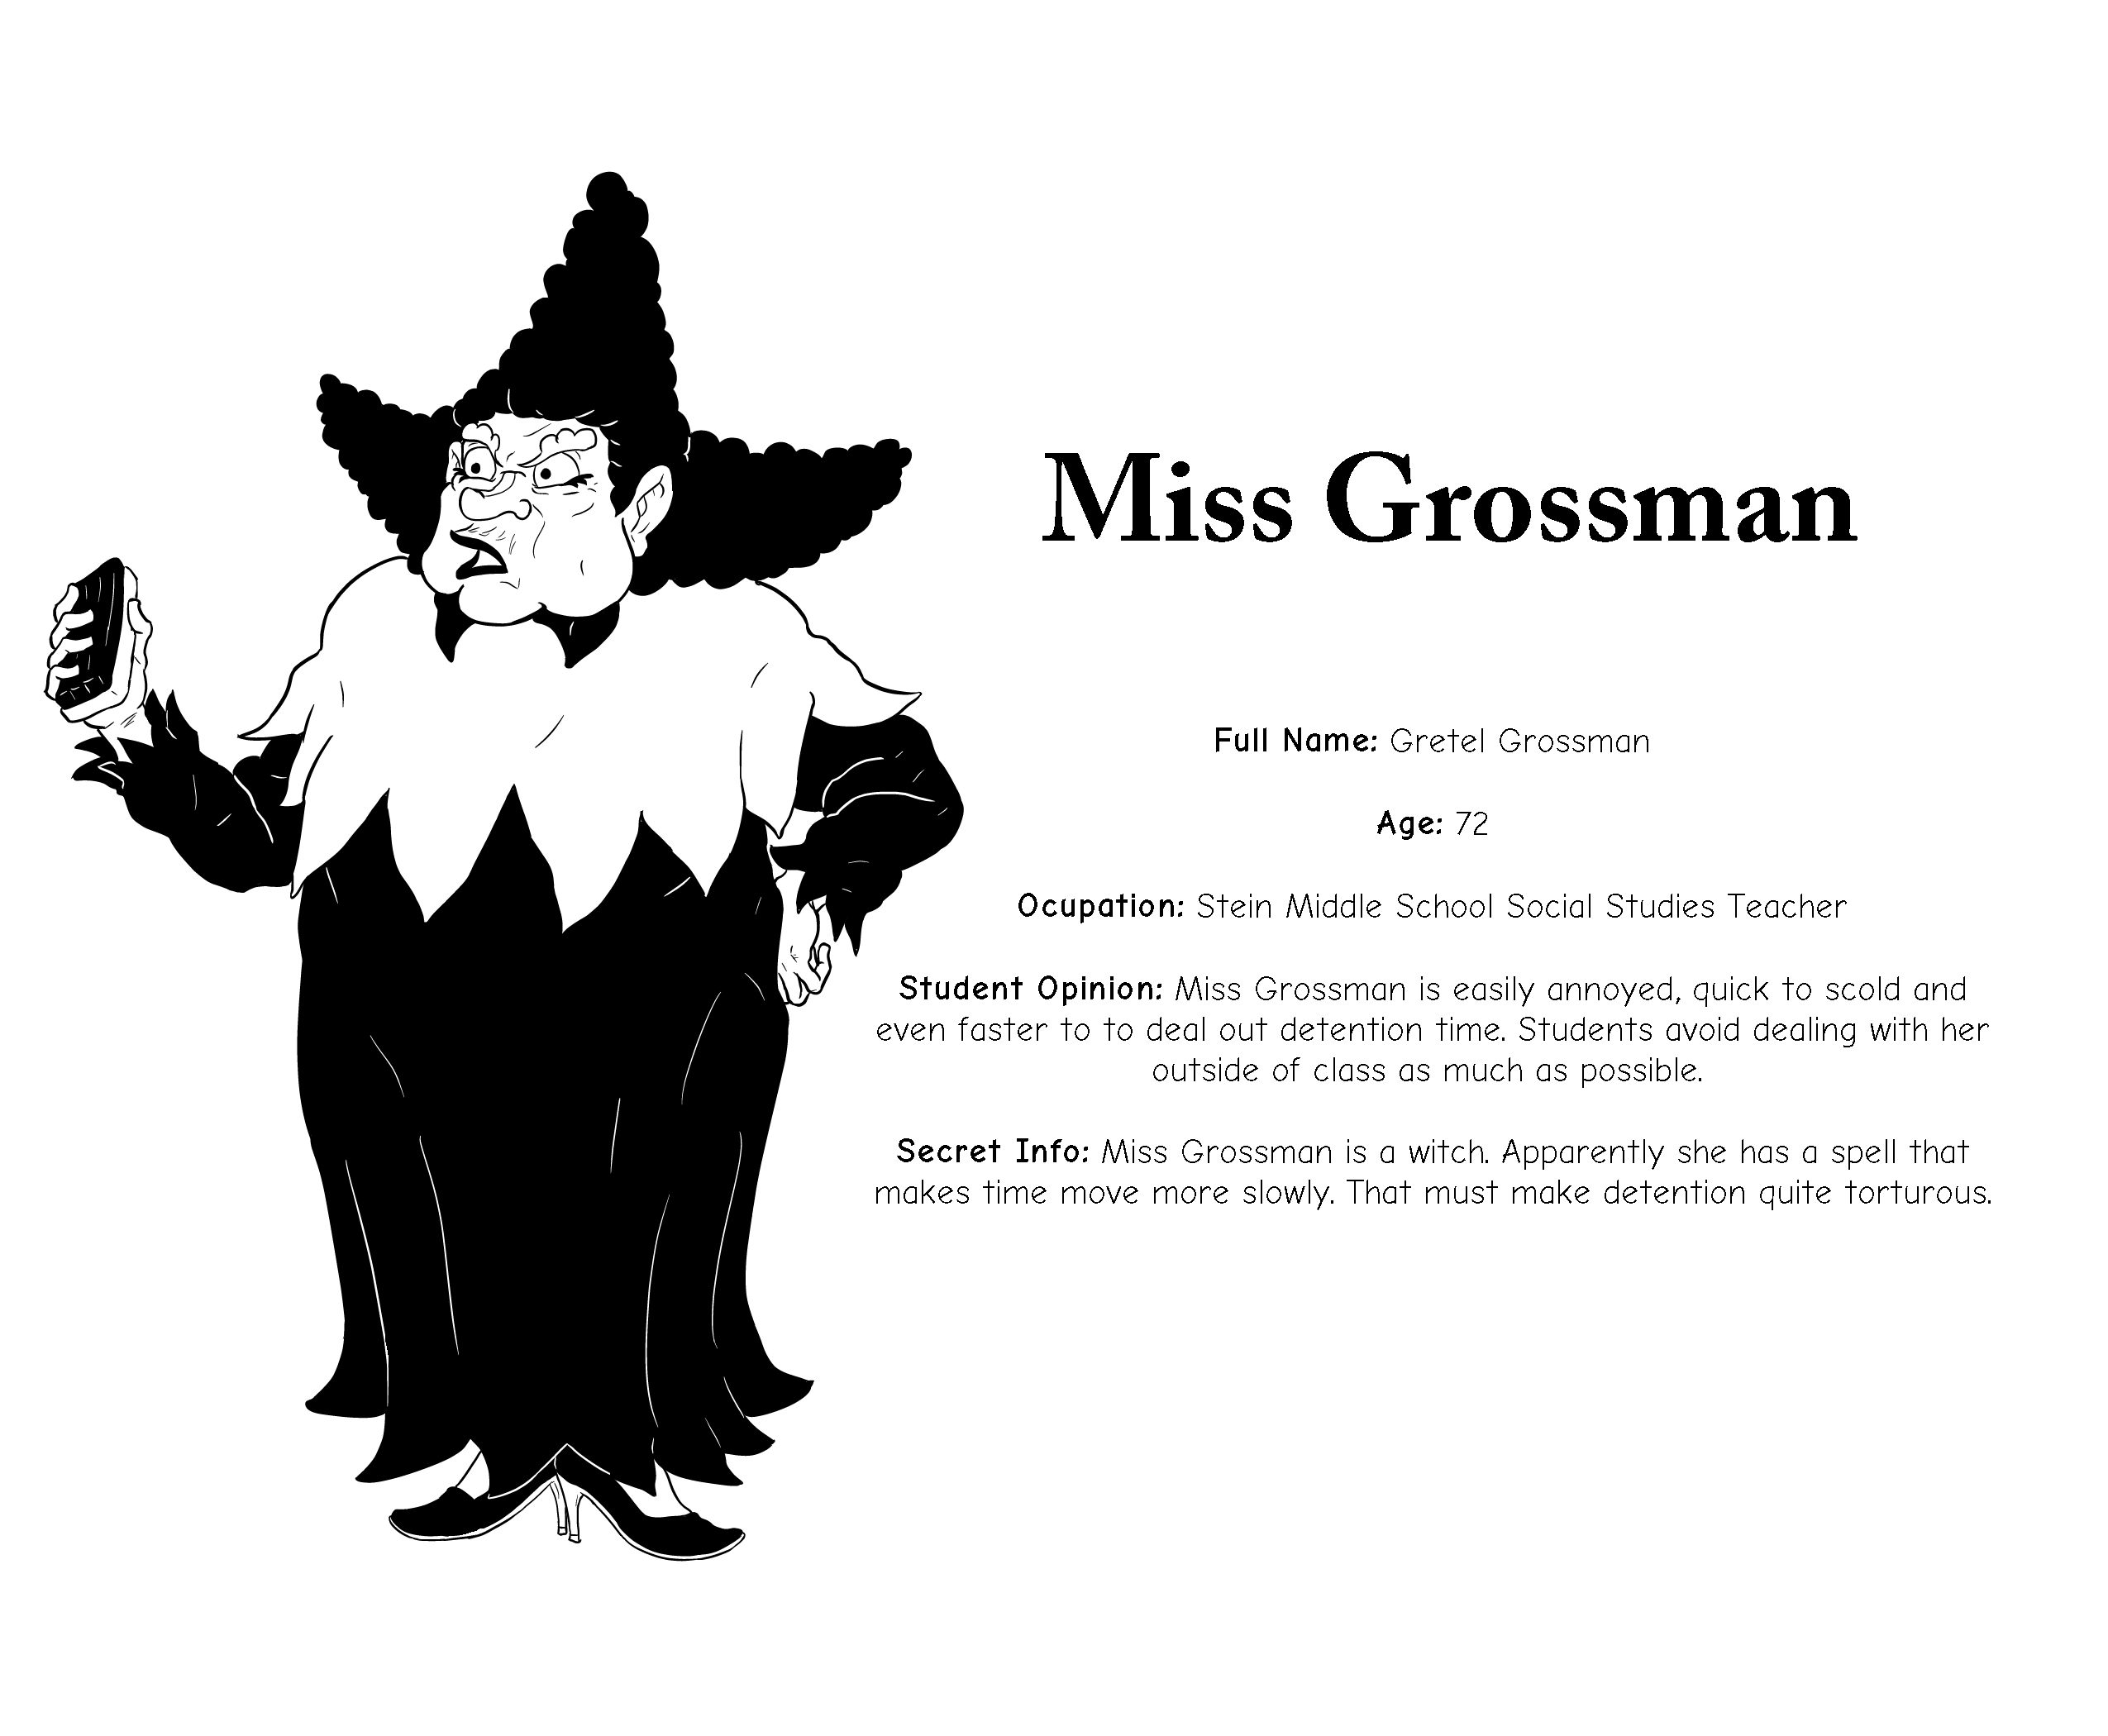 Miss Grossman